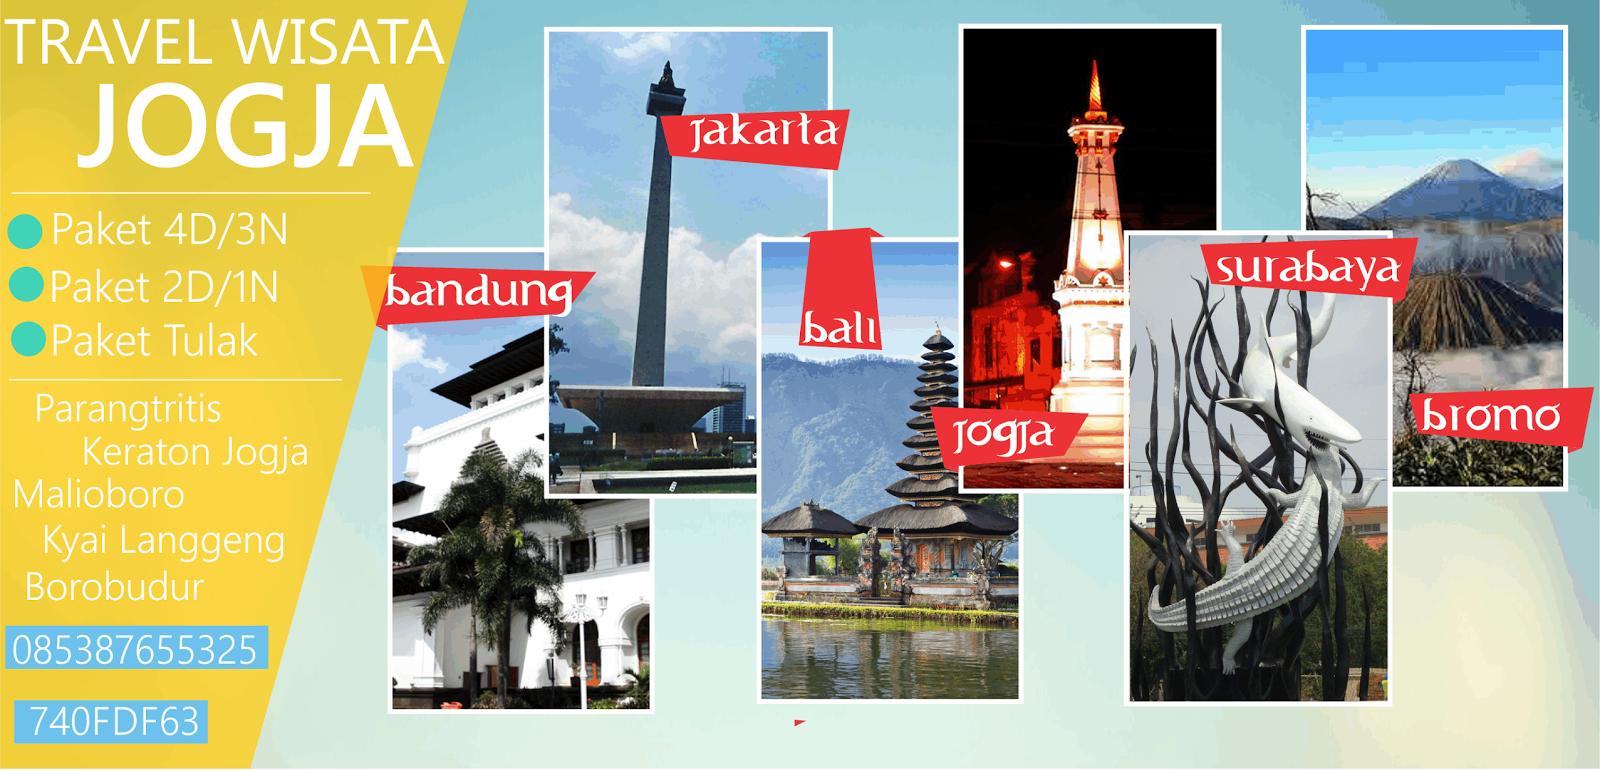 Travel Surabaya Travel Wisata Travel Jakarta Bandung Paket Wisata Ke Yogyakarta